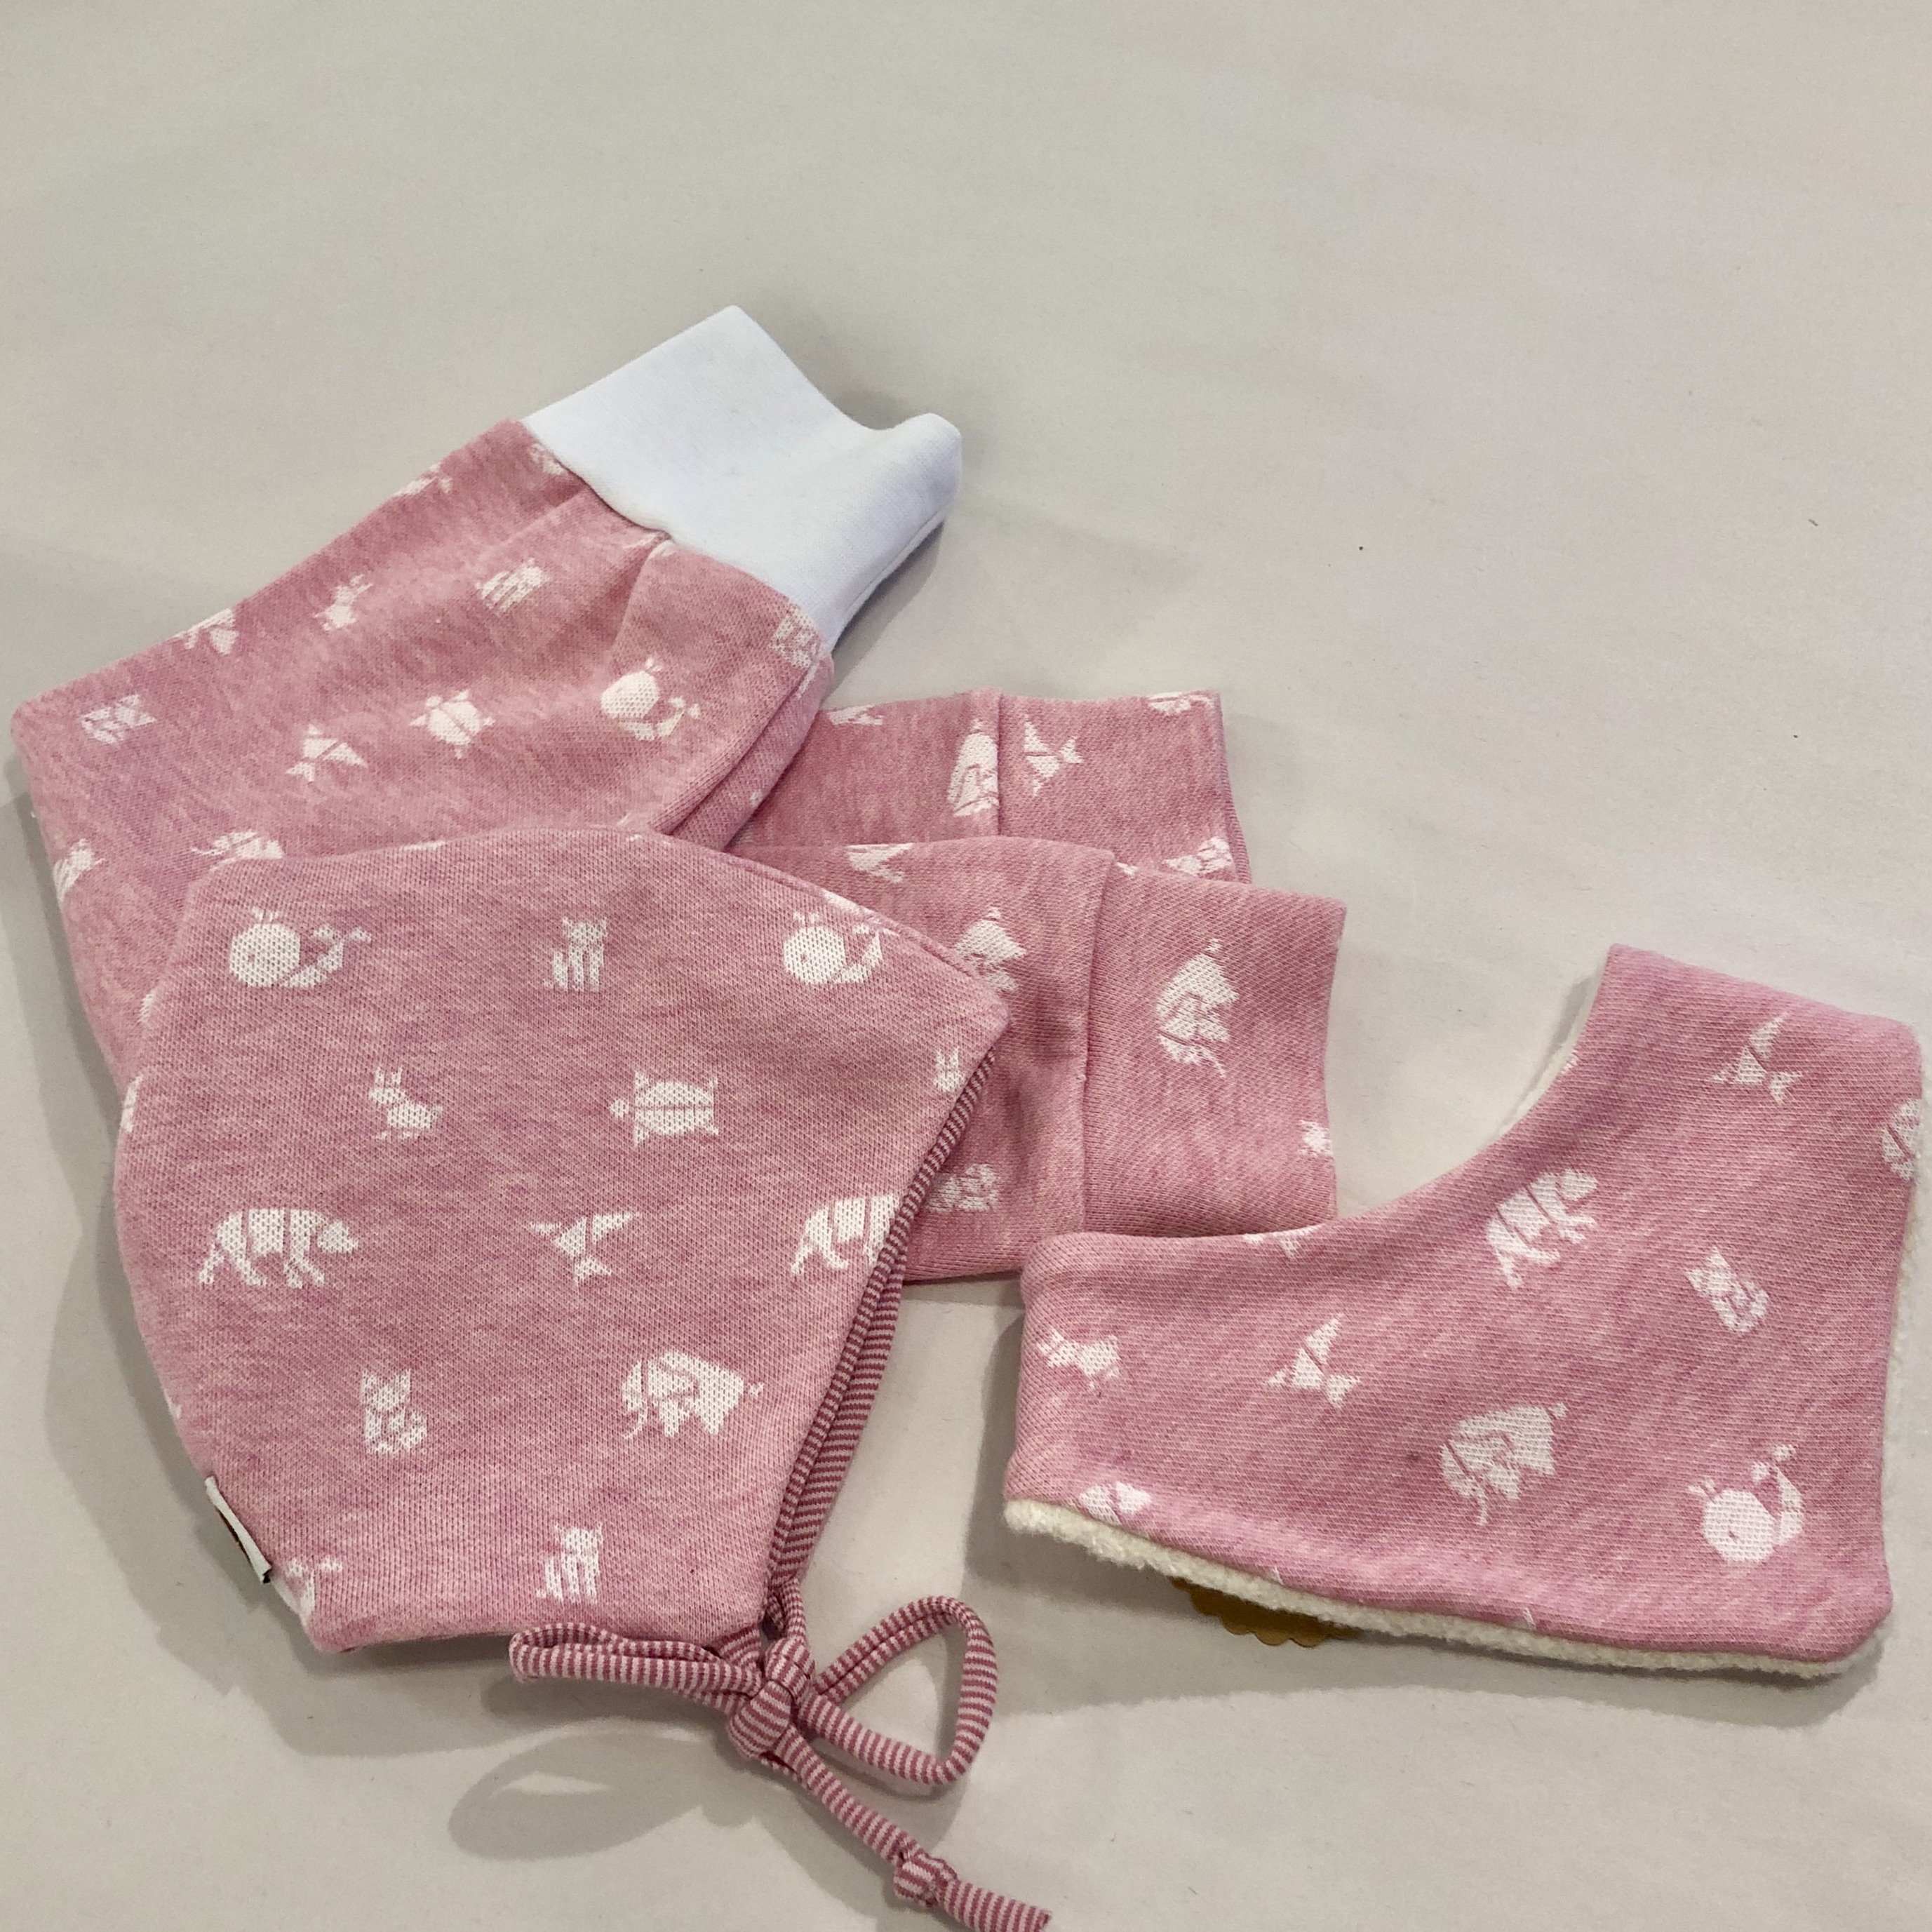 Einzelstück X 8-Baby-Set Origami Rosa